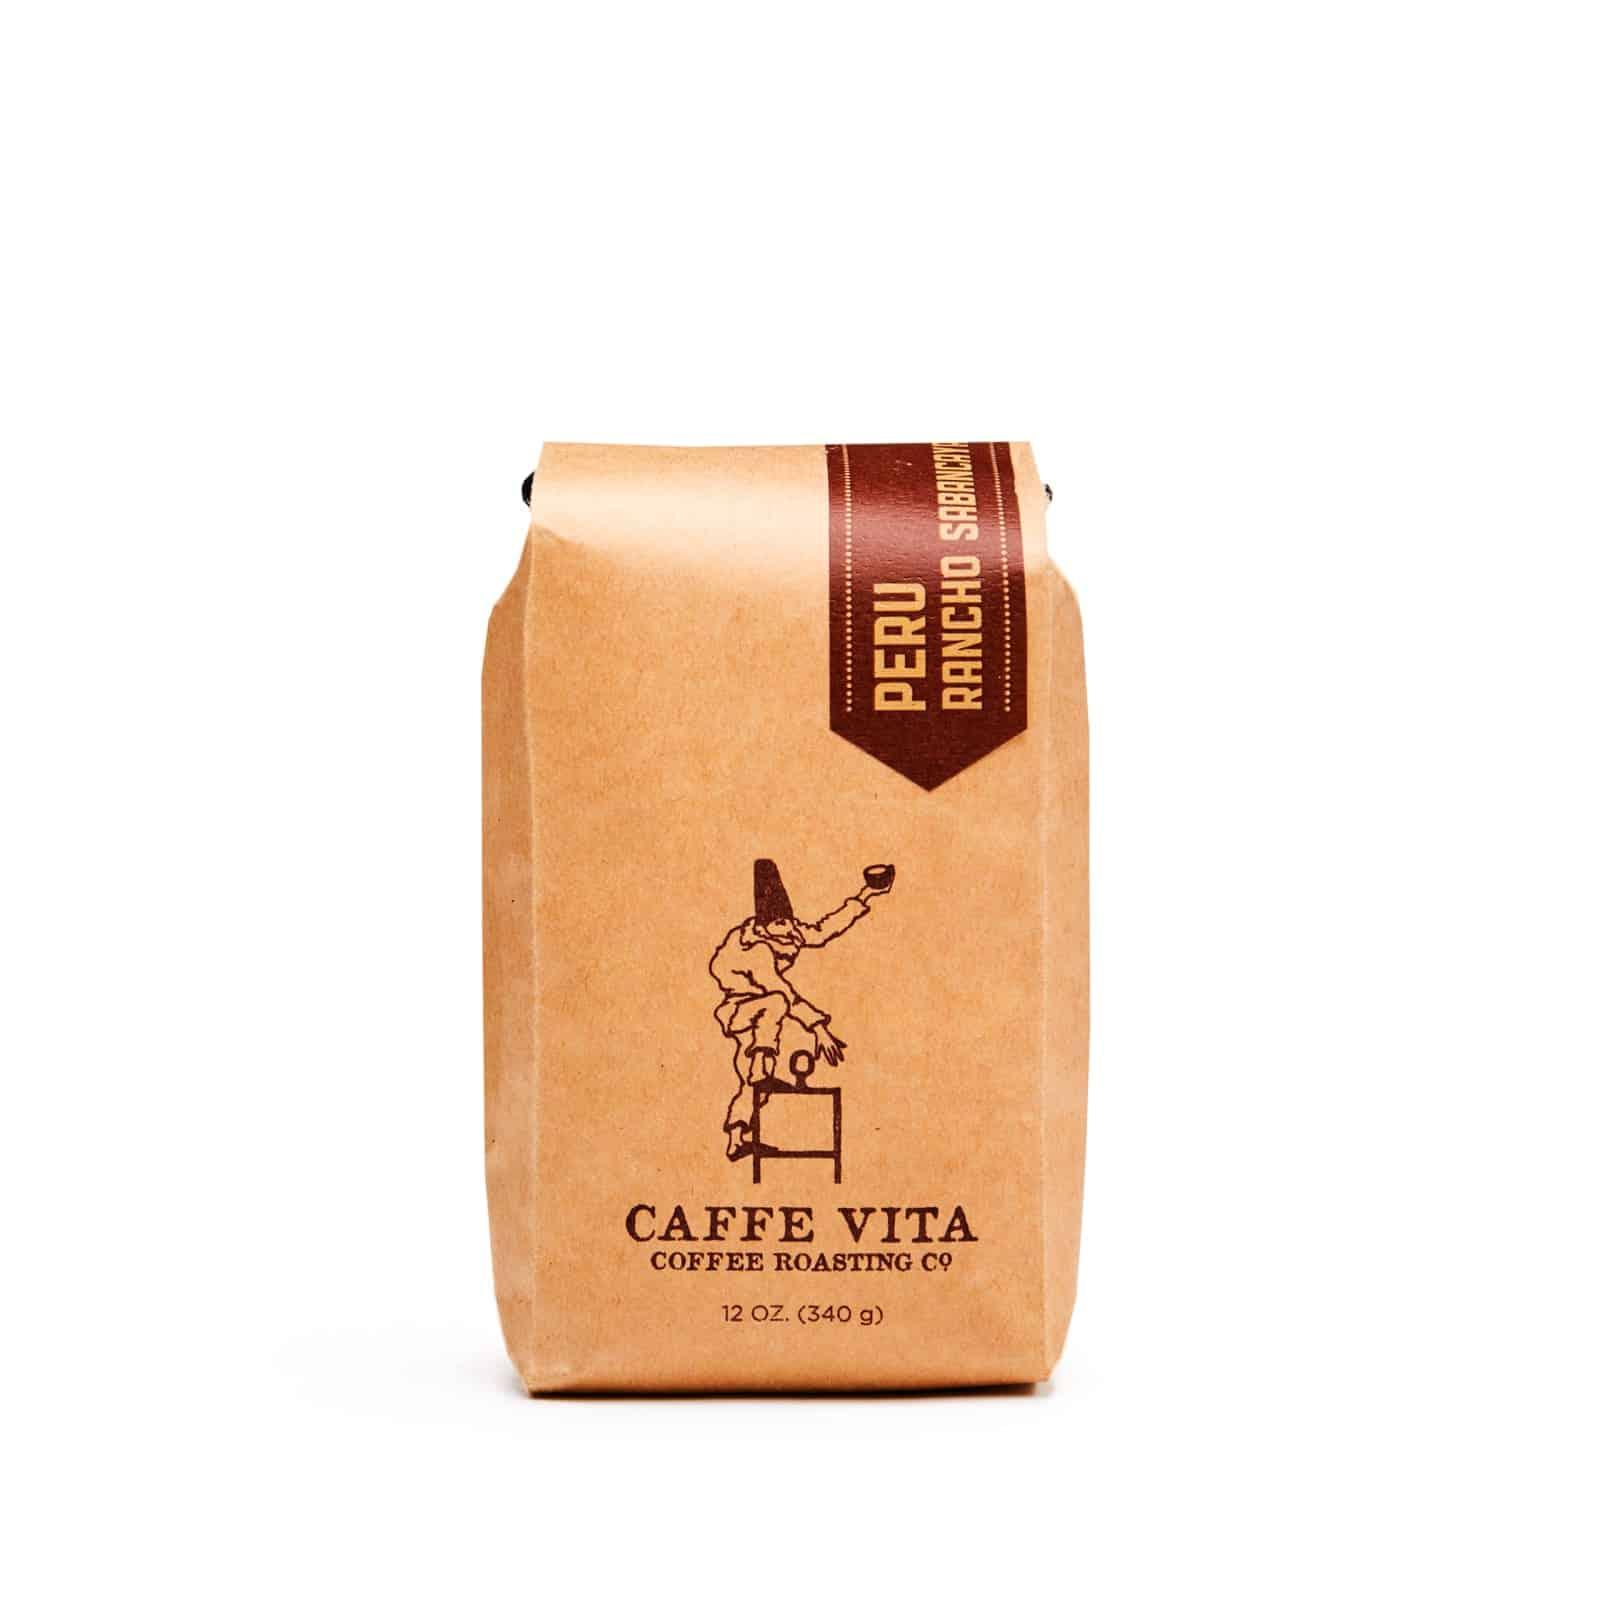 caffee vita coffee